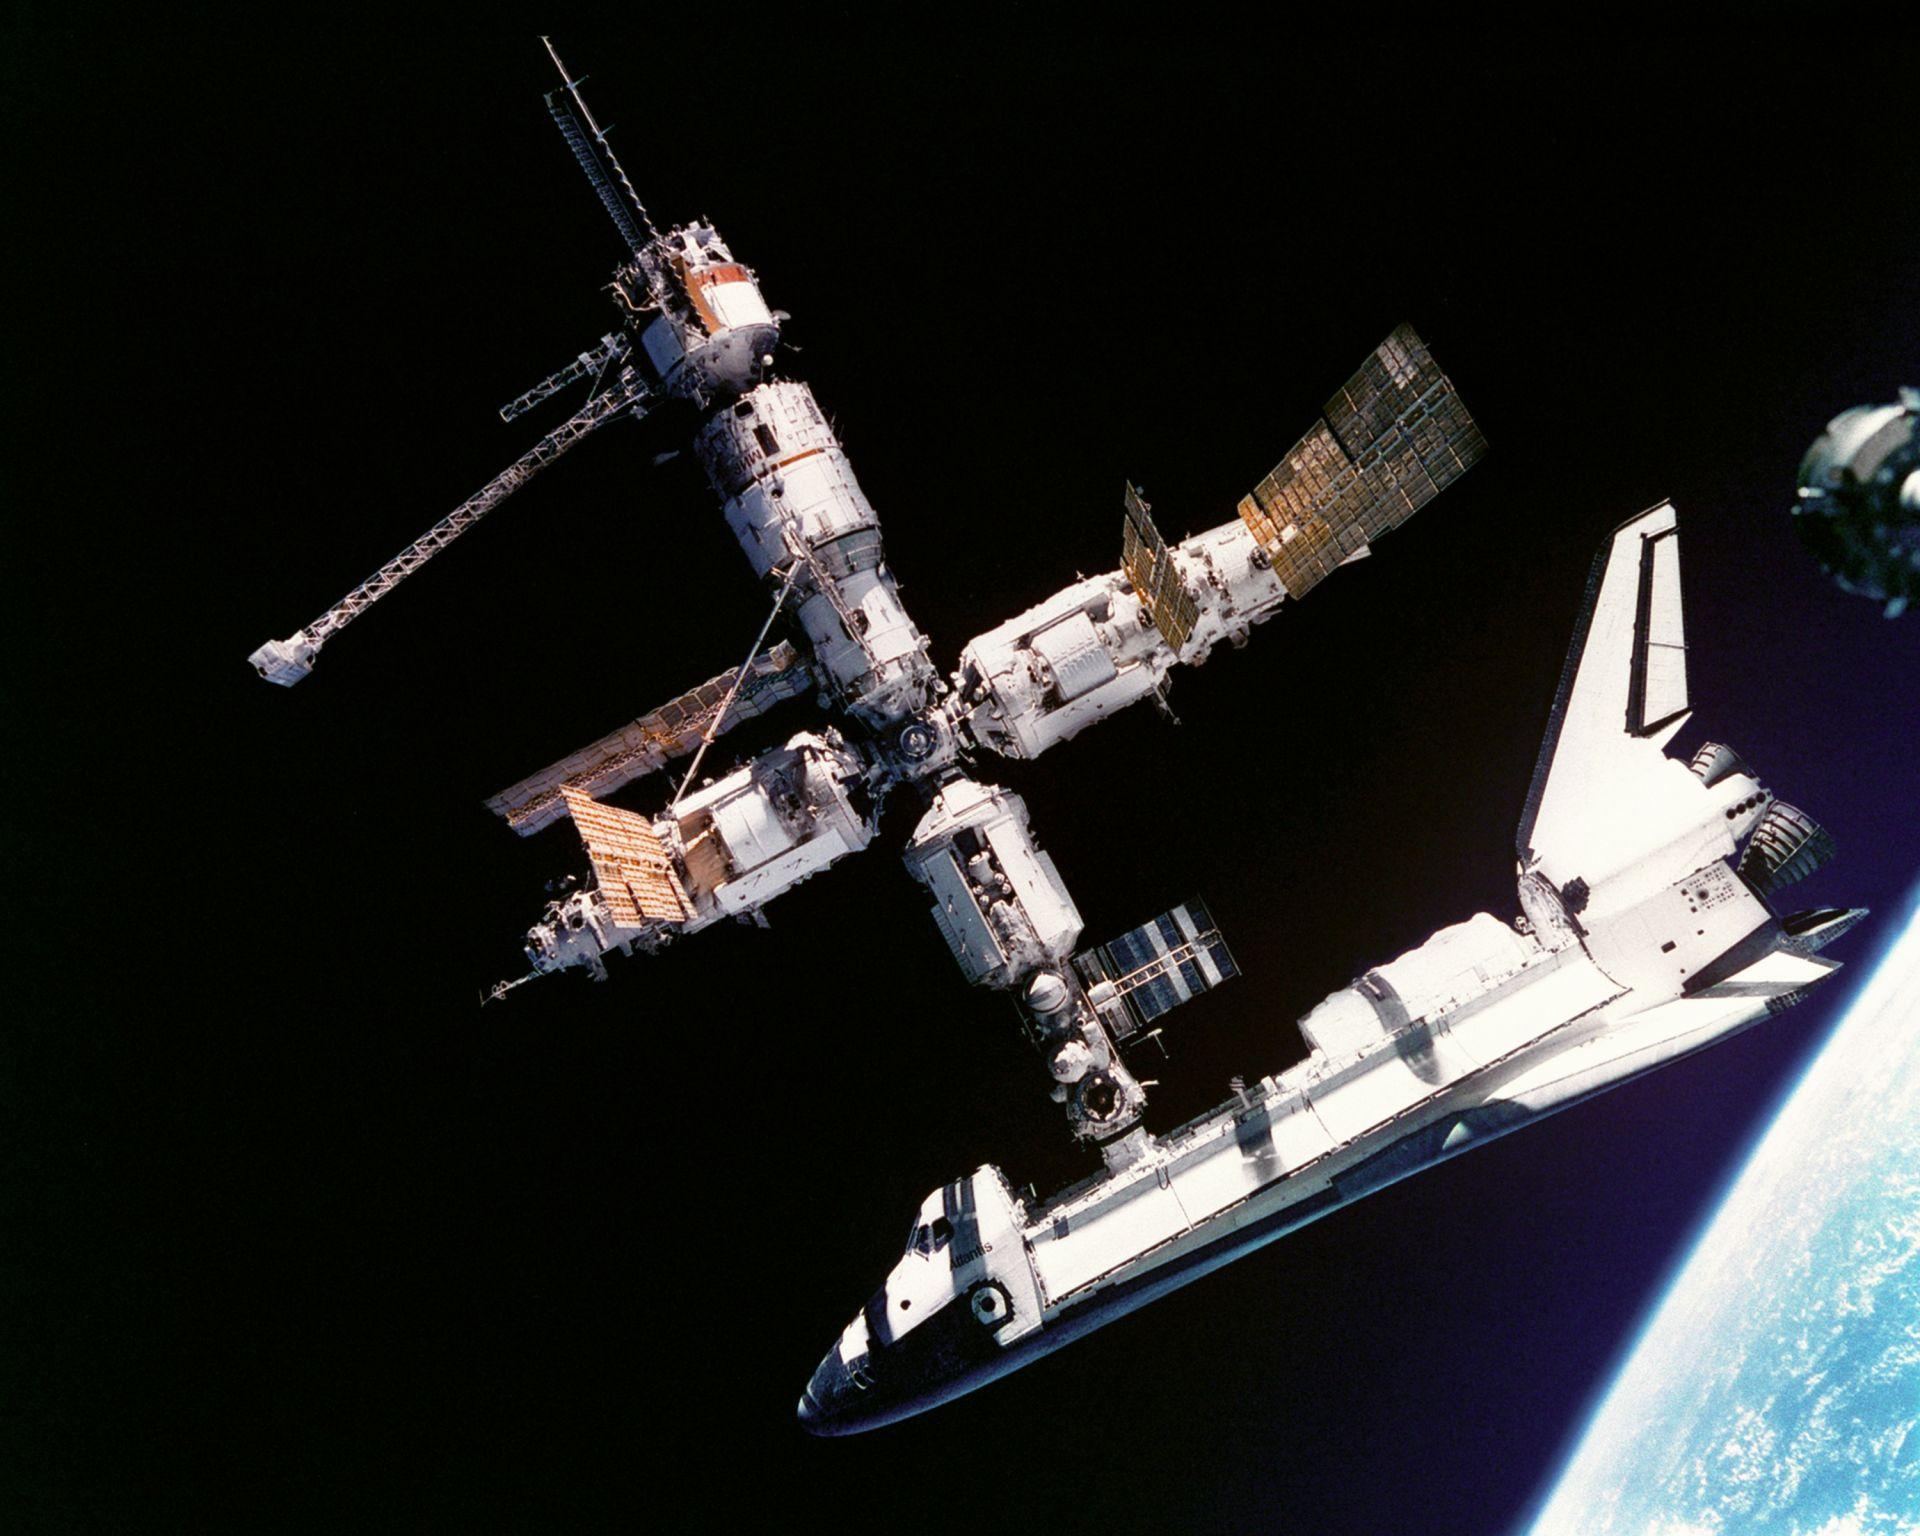 Shuttle - MIR - Atlantis - Juin 1995 - Soyouz - Coopération URSS - USA